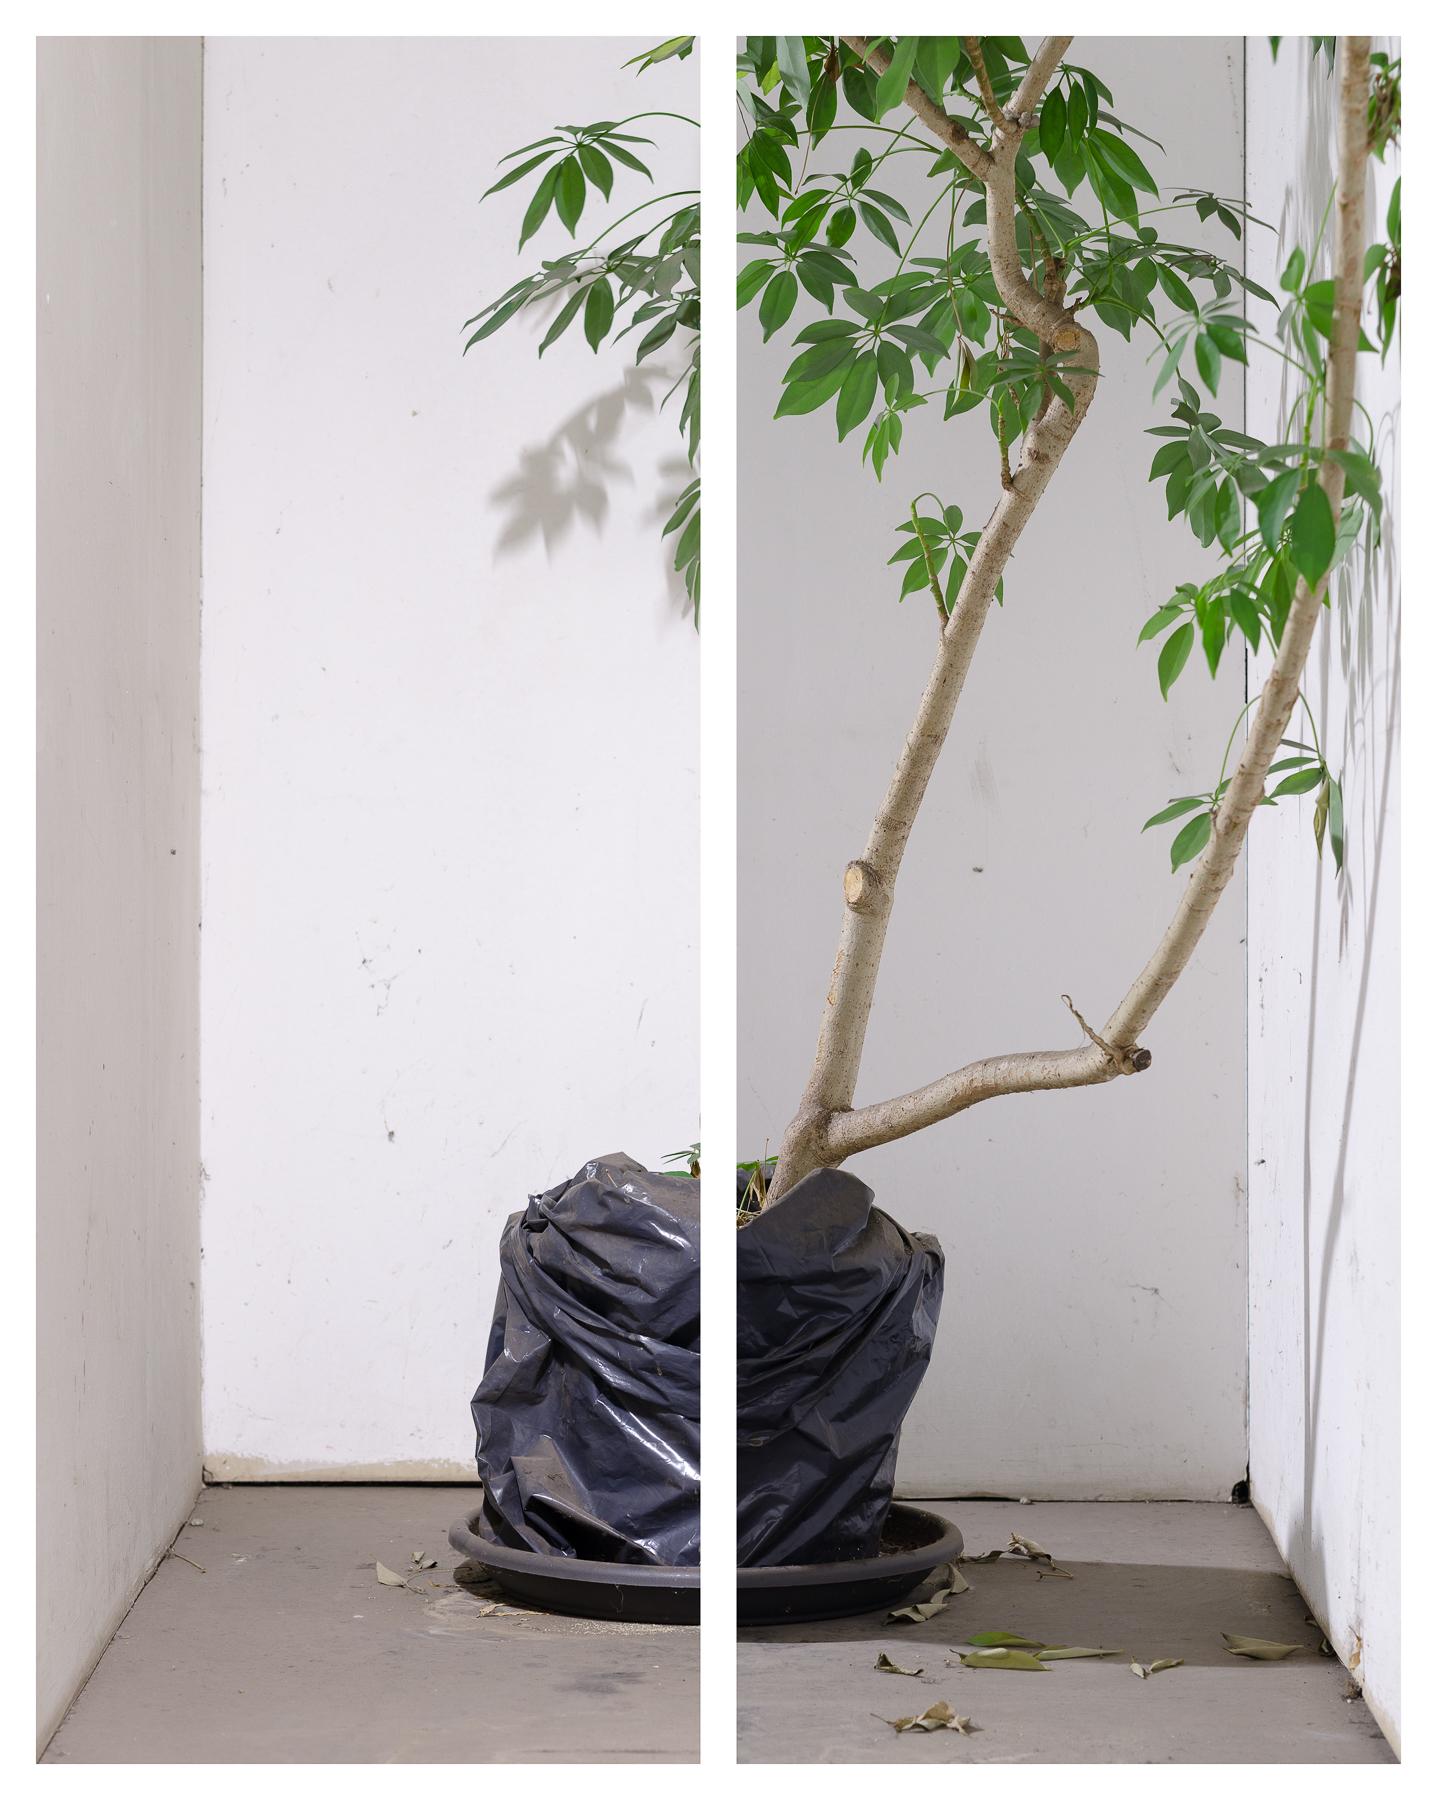 Topfpflanze, 2016 Inkjet-Pigmentdruck 2-teilig zu je 156 × 60 cm